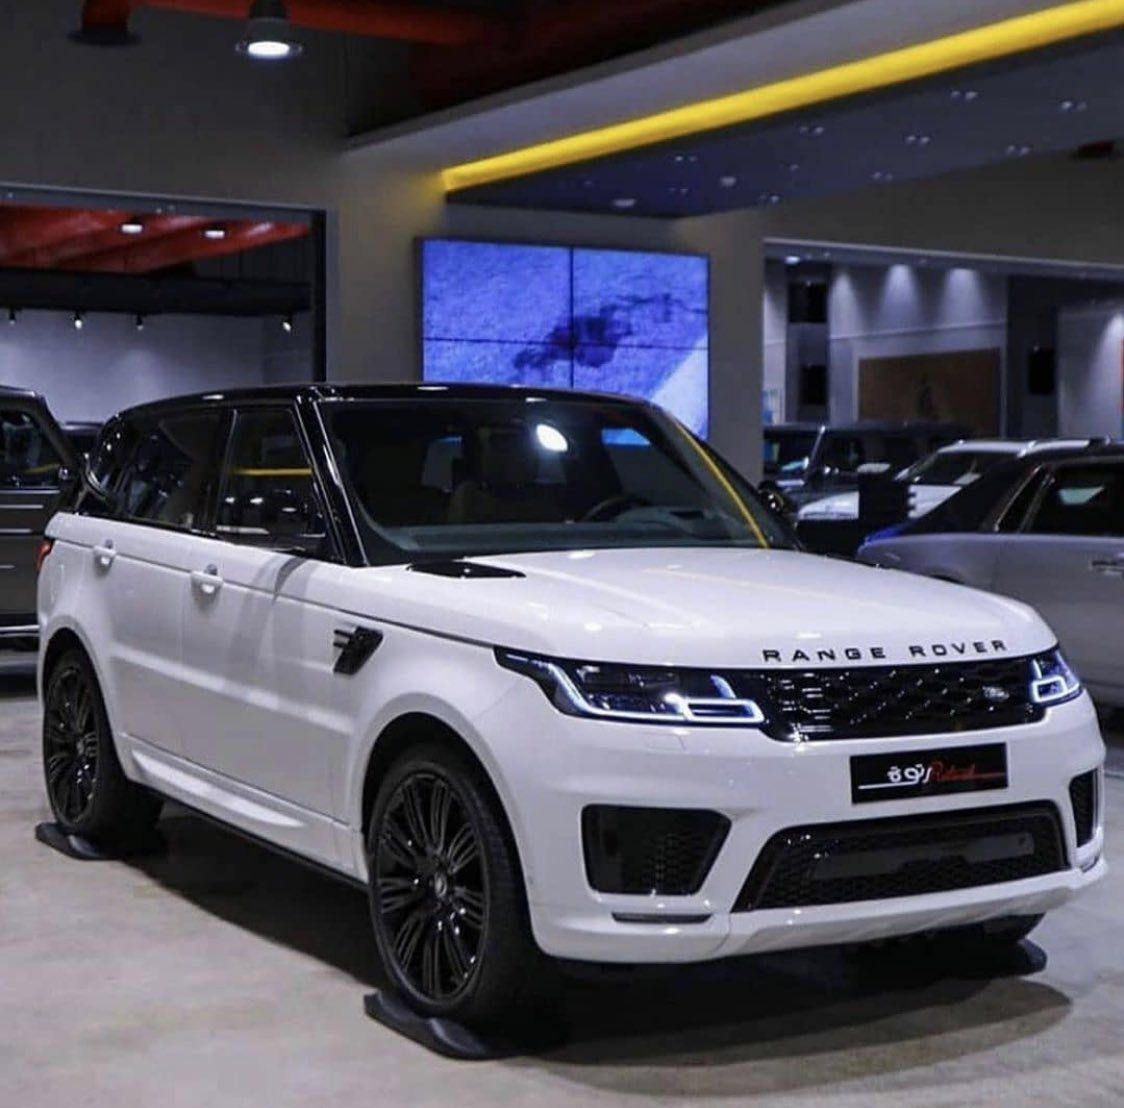 #rangerover #urus #rollsroyceclassiccars #audi #cars #car #luxurycar #Lamborghini #Bentley #rollroyce #gwagon #wagon #carinterior #carexterior #interior #exterior #celebrity #celebritycars #expensive #expensivecar #Mercedes #Porsche